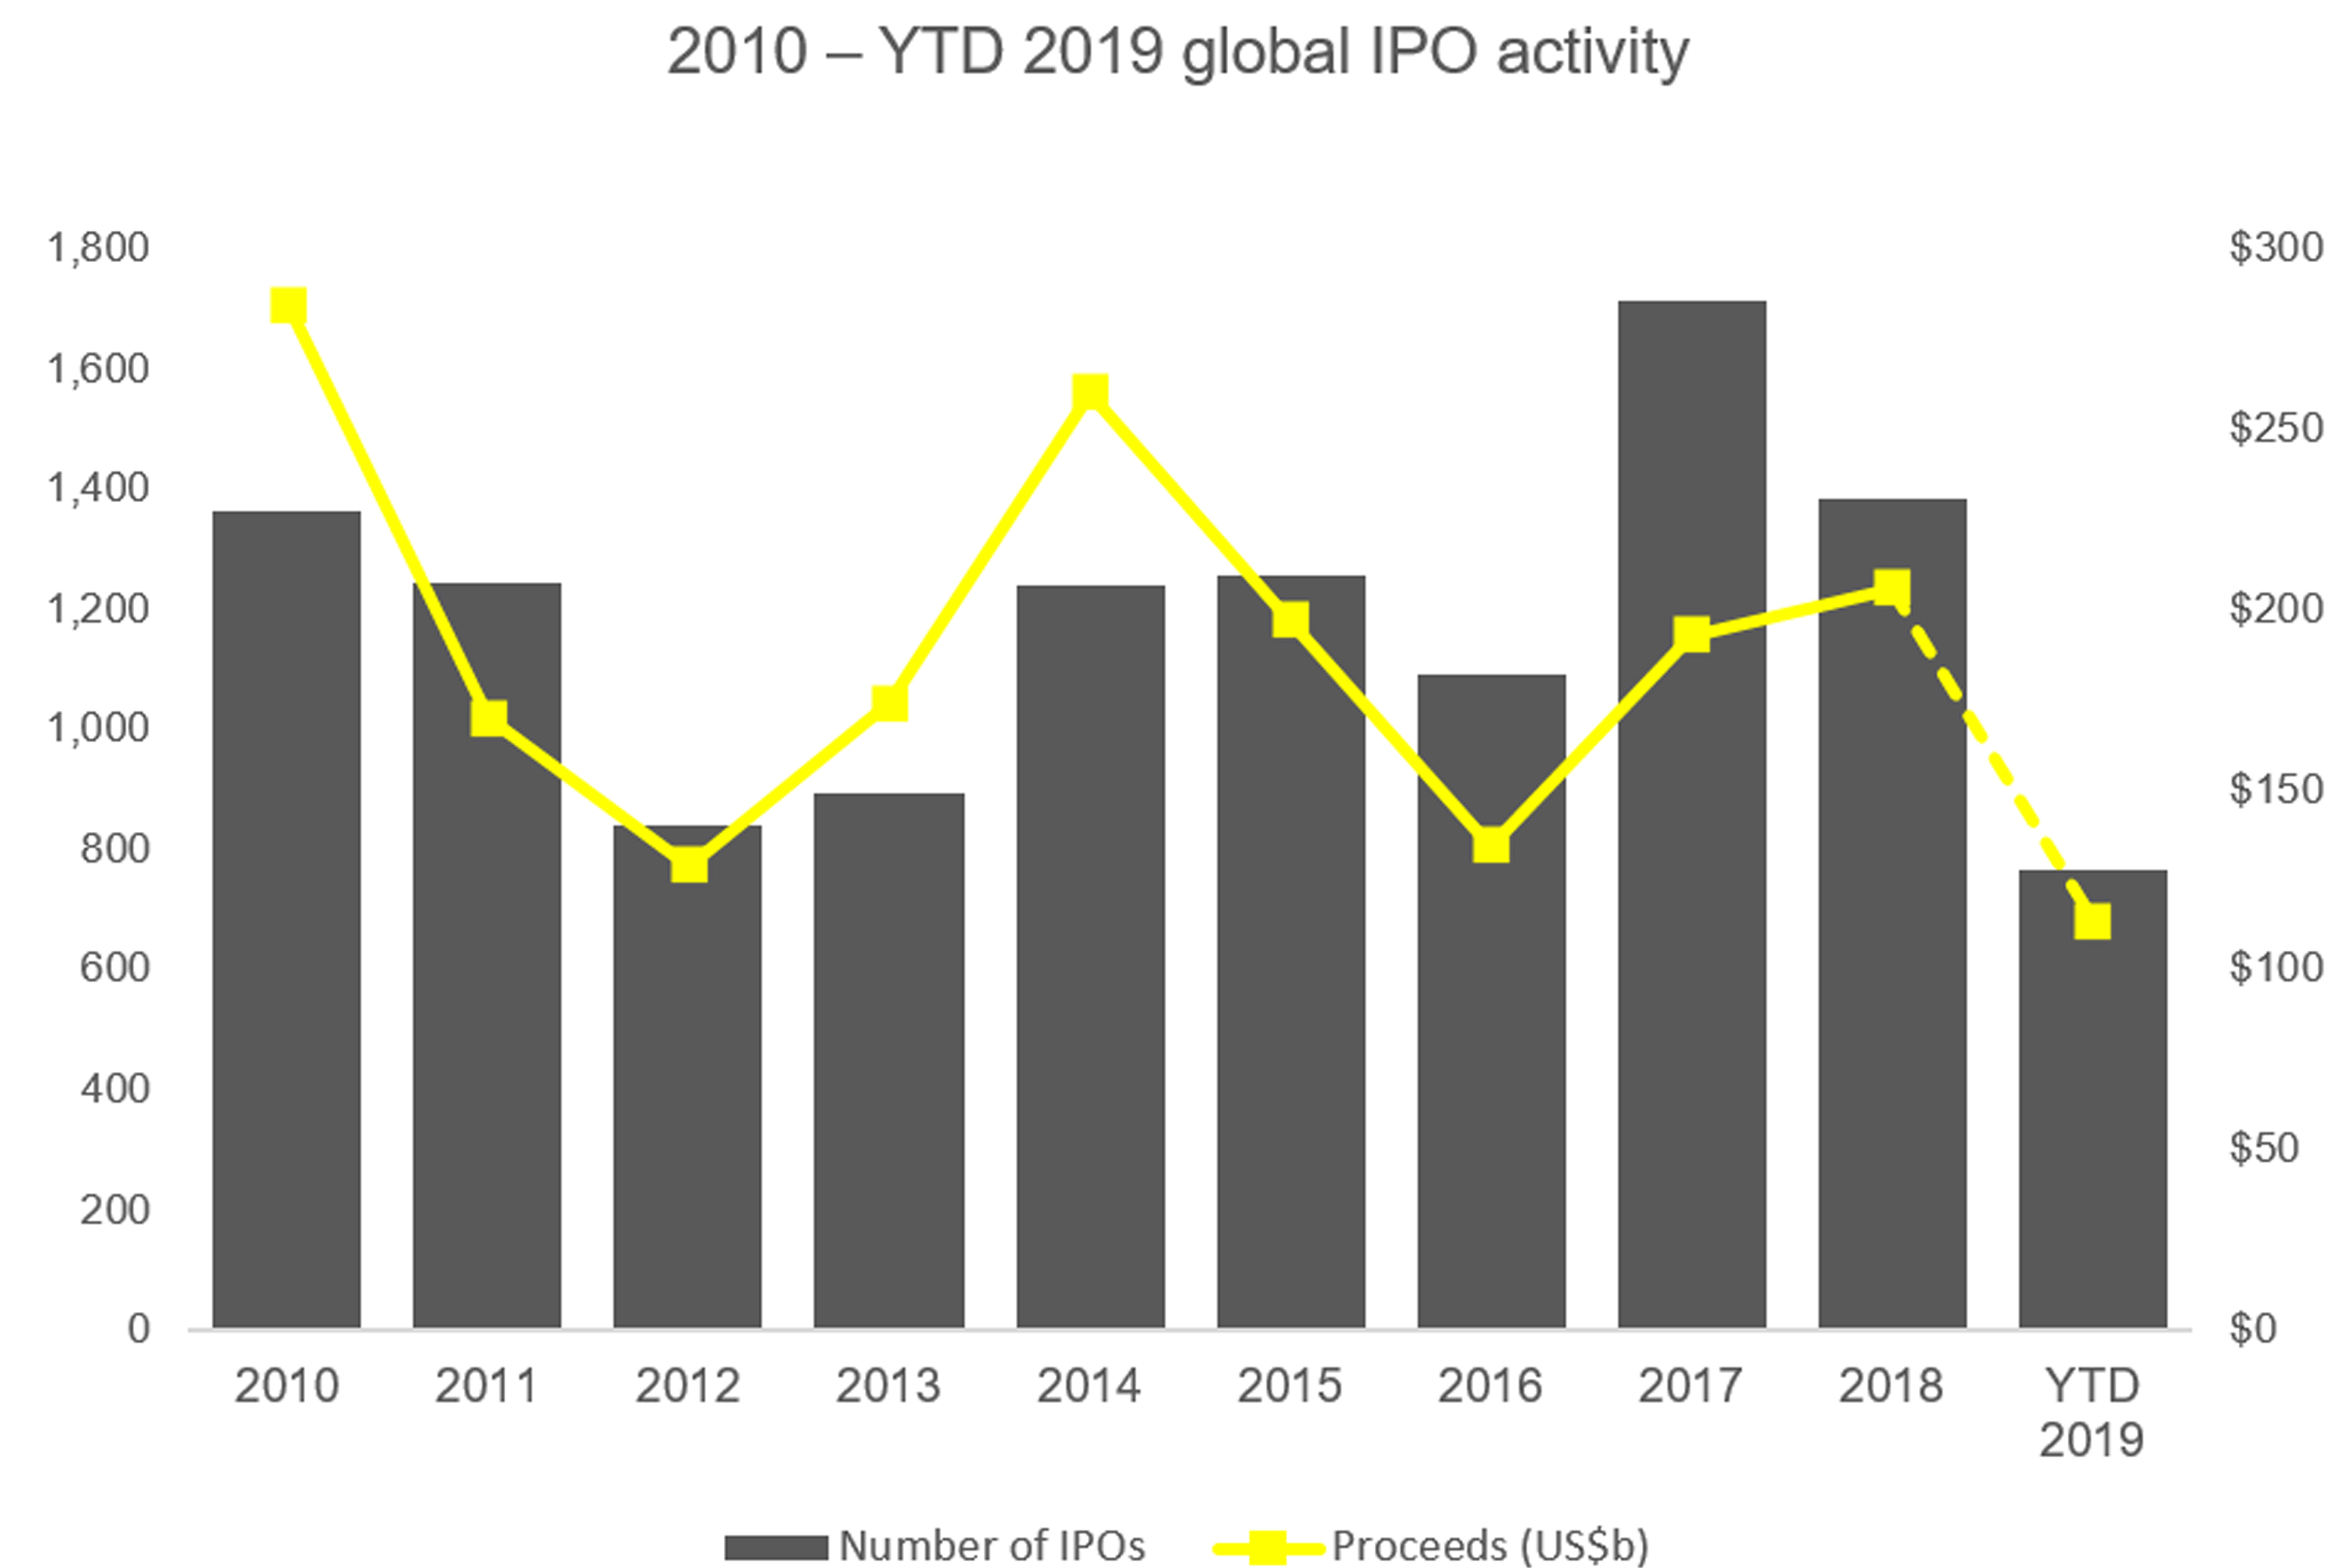 Graphic: 2010 – YTD 2019 global IPO activity